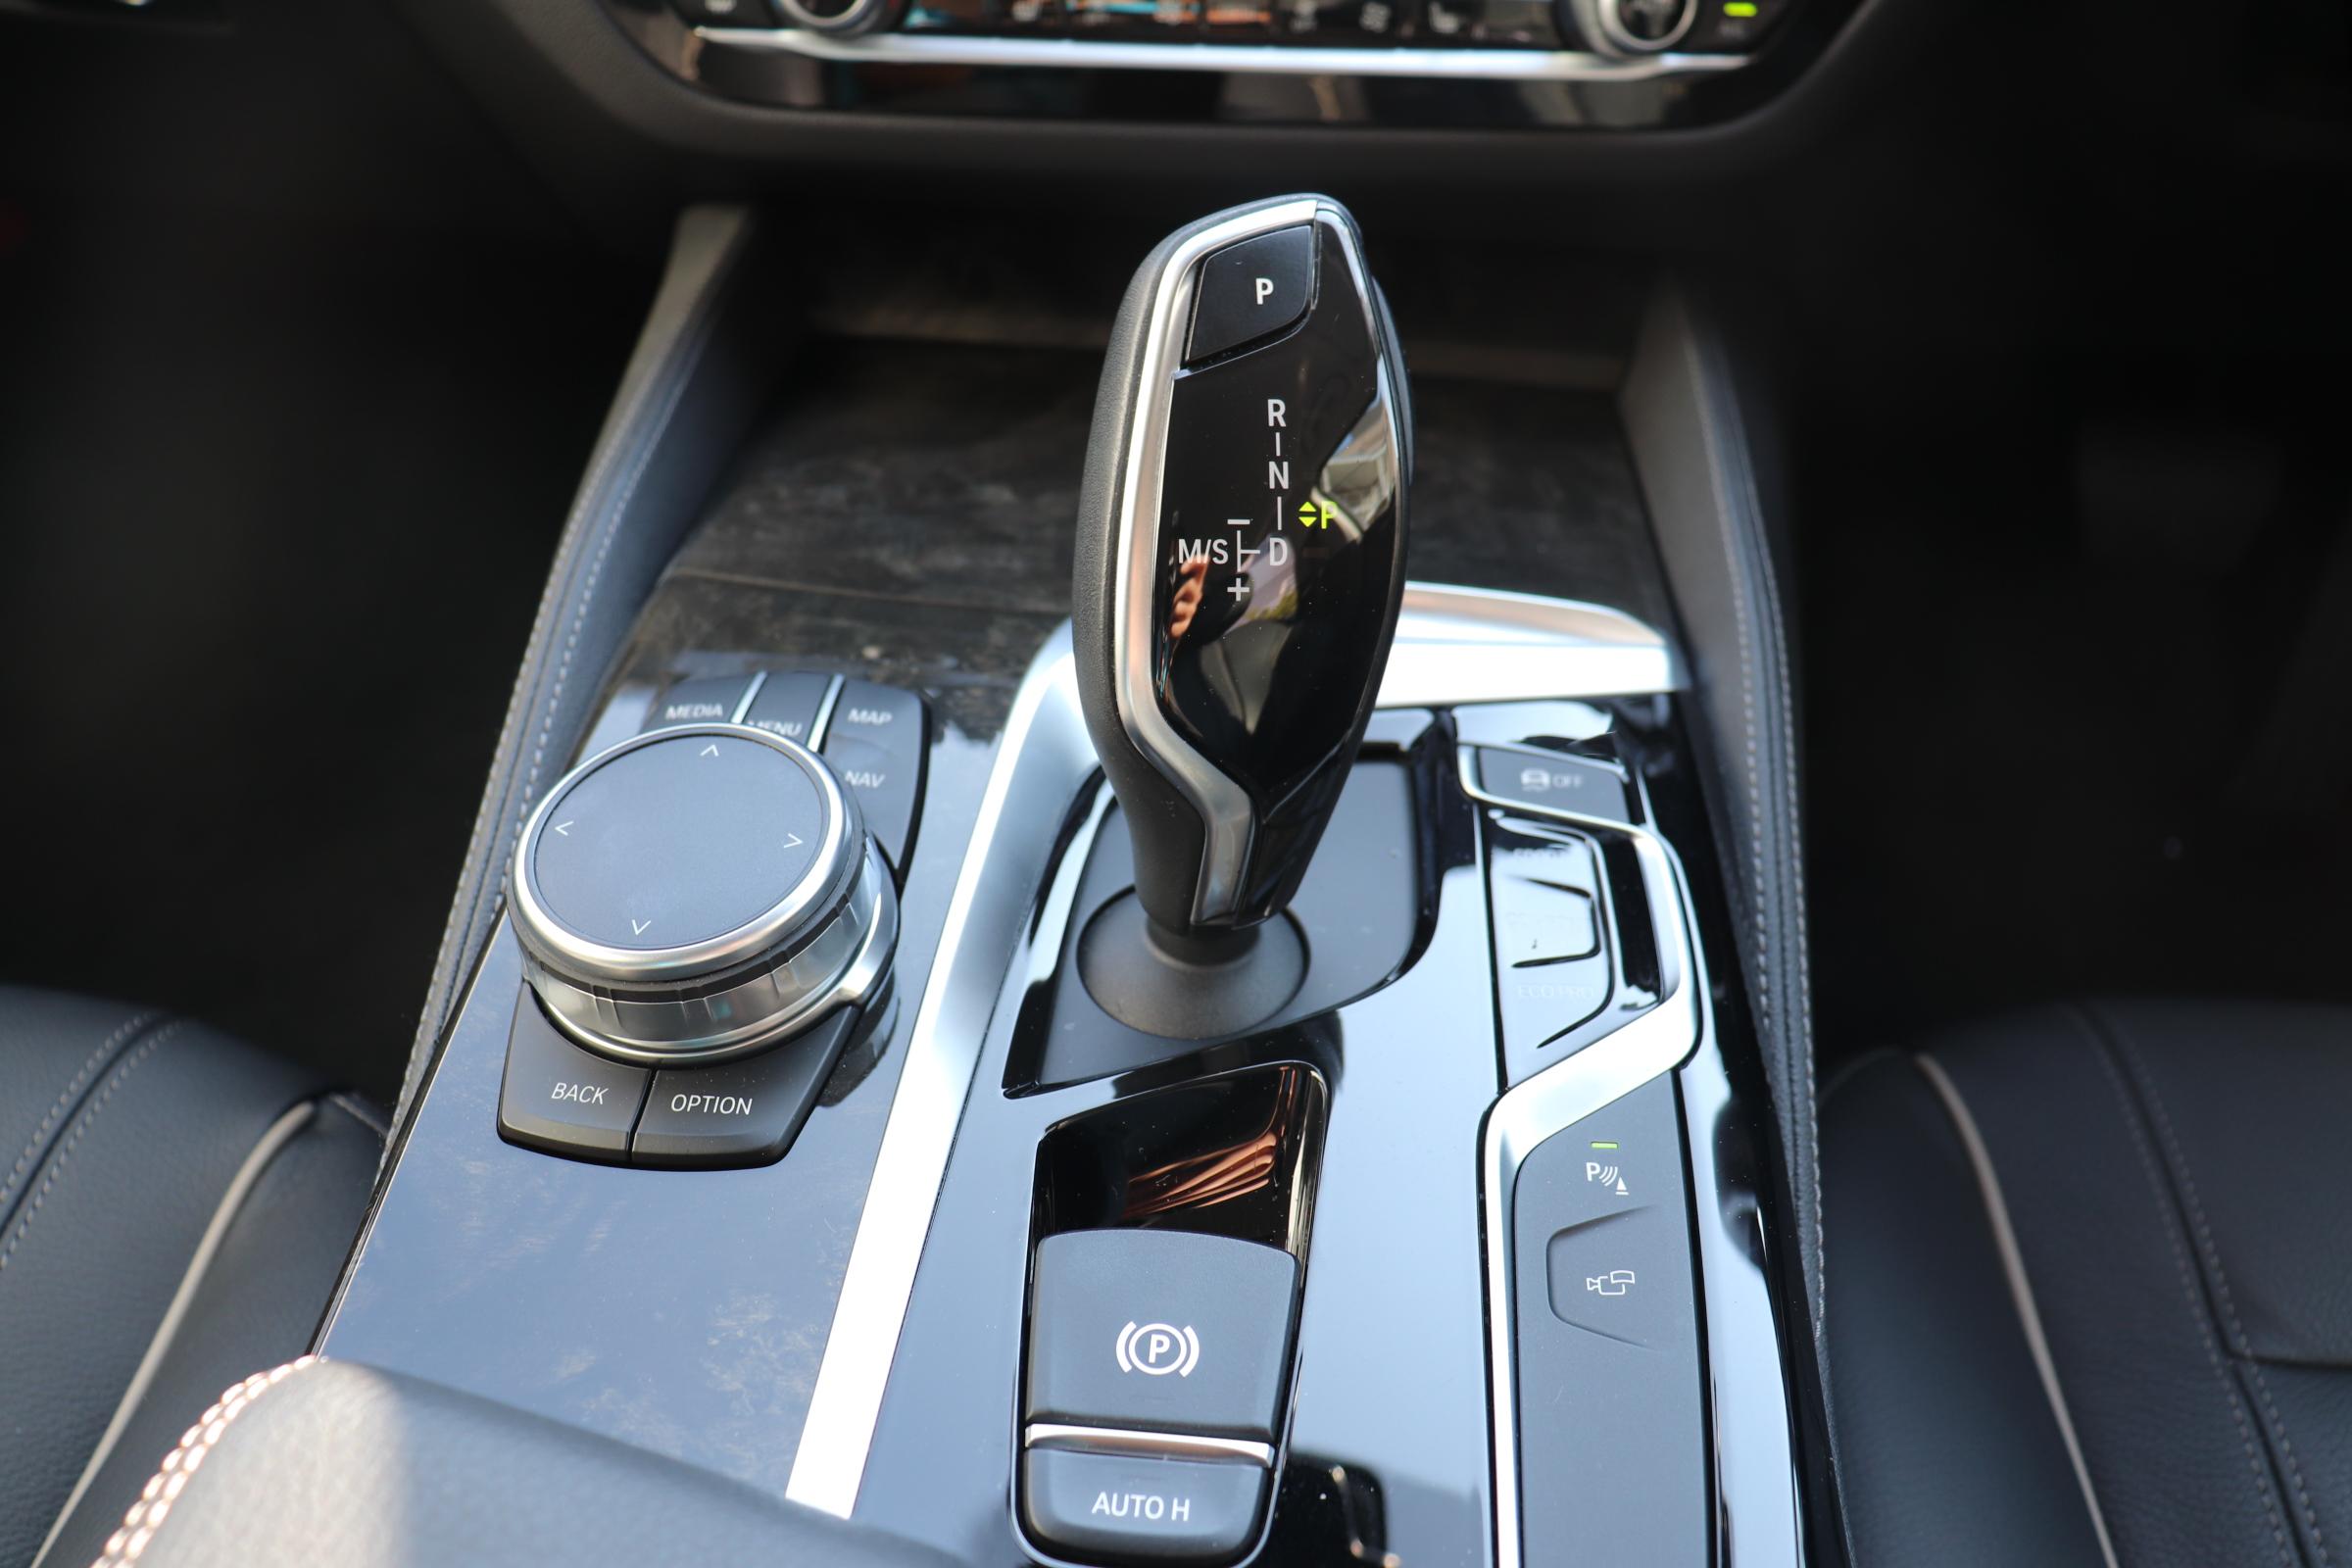 523dツーリング ラグジュアリー BEAMコンプリートカー 黒革 HUD ワンオーナー車両画像10